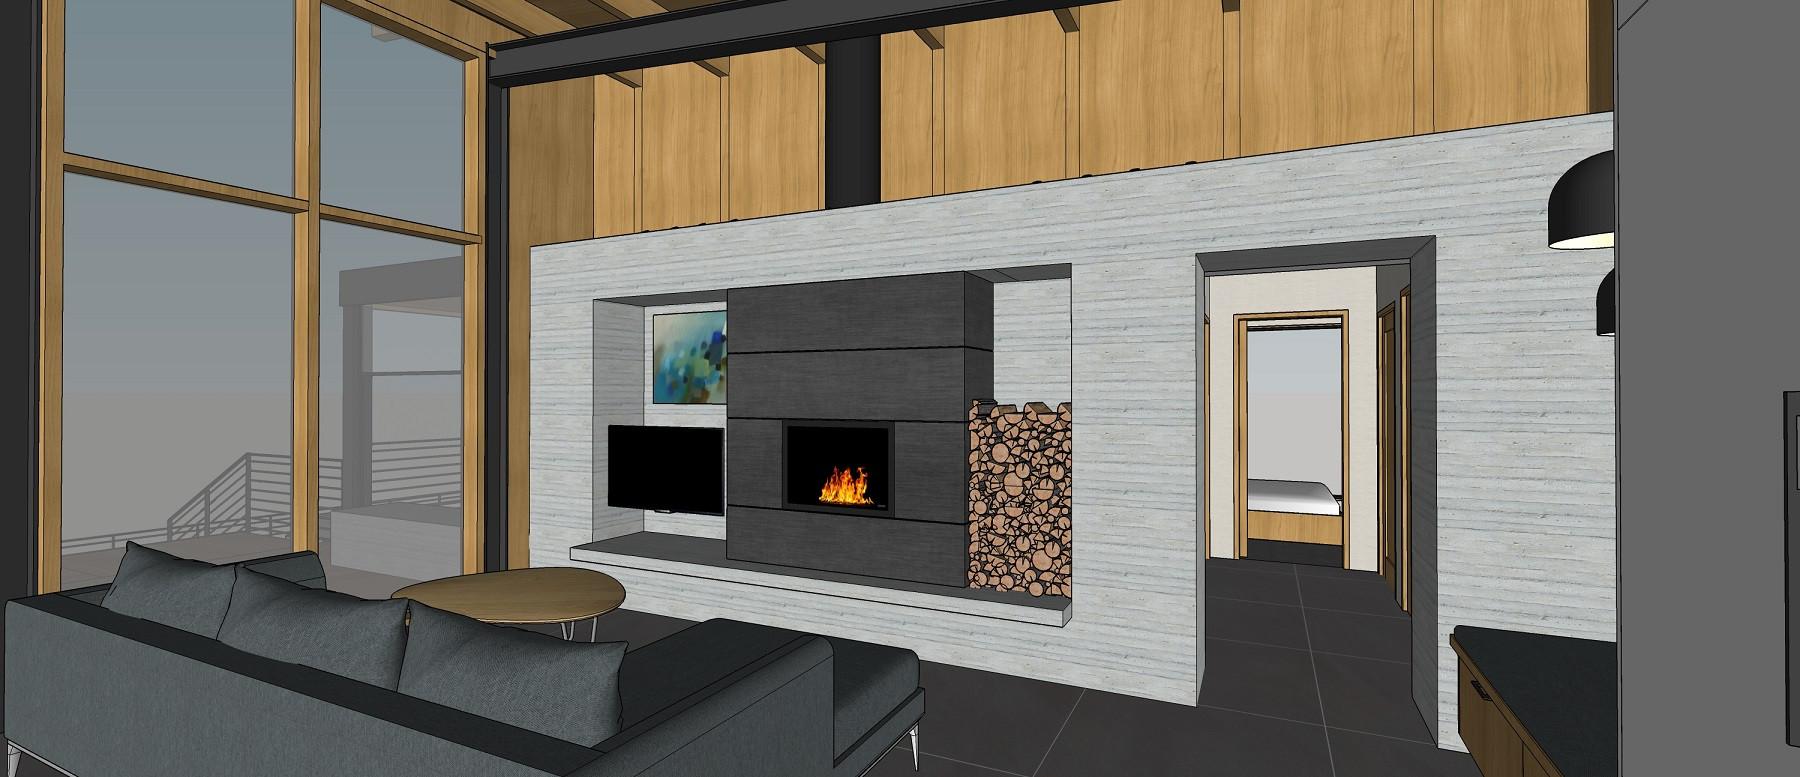 A1 A1 12. Living Room Option 2.jpg